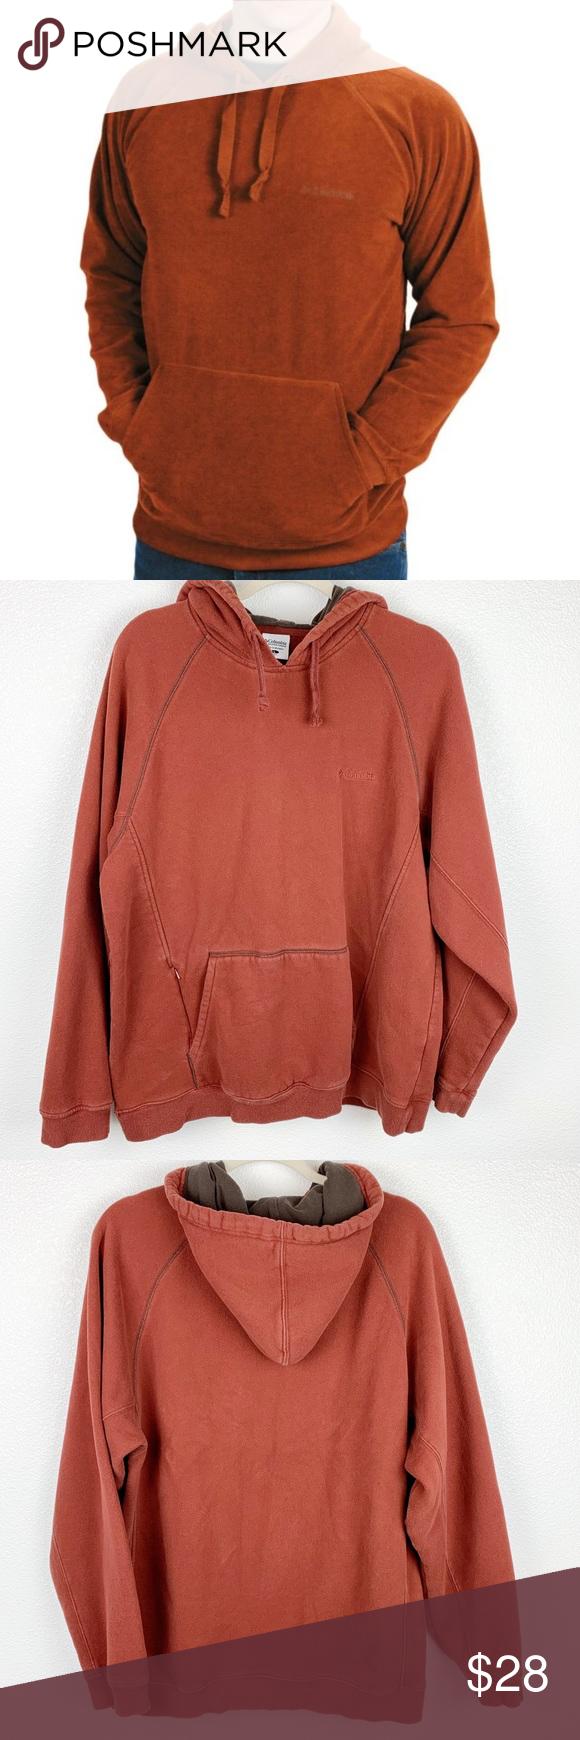 Columbia Burnt Orange Men S Hoodie Large Pullover Sweatshirts Hoodies Hoodies Men [ 1740 x 580 Pixel ]